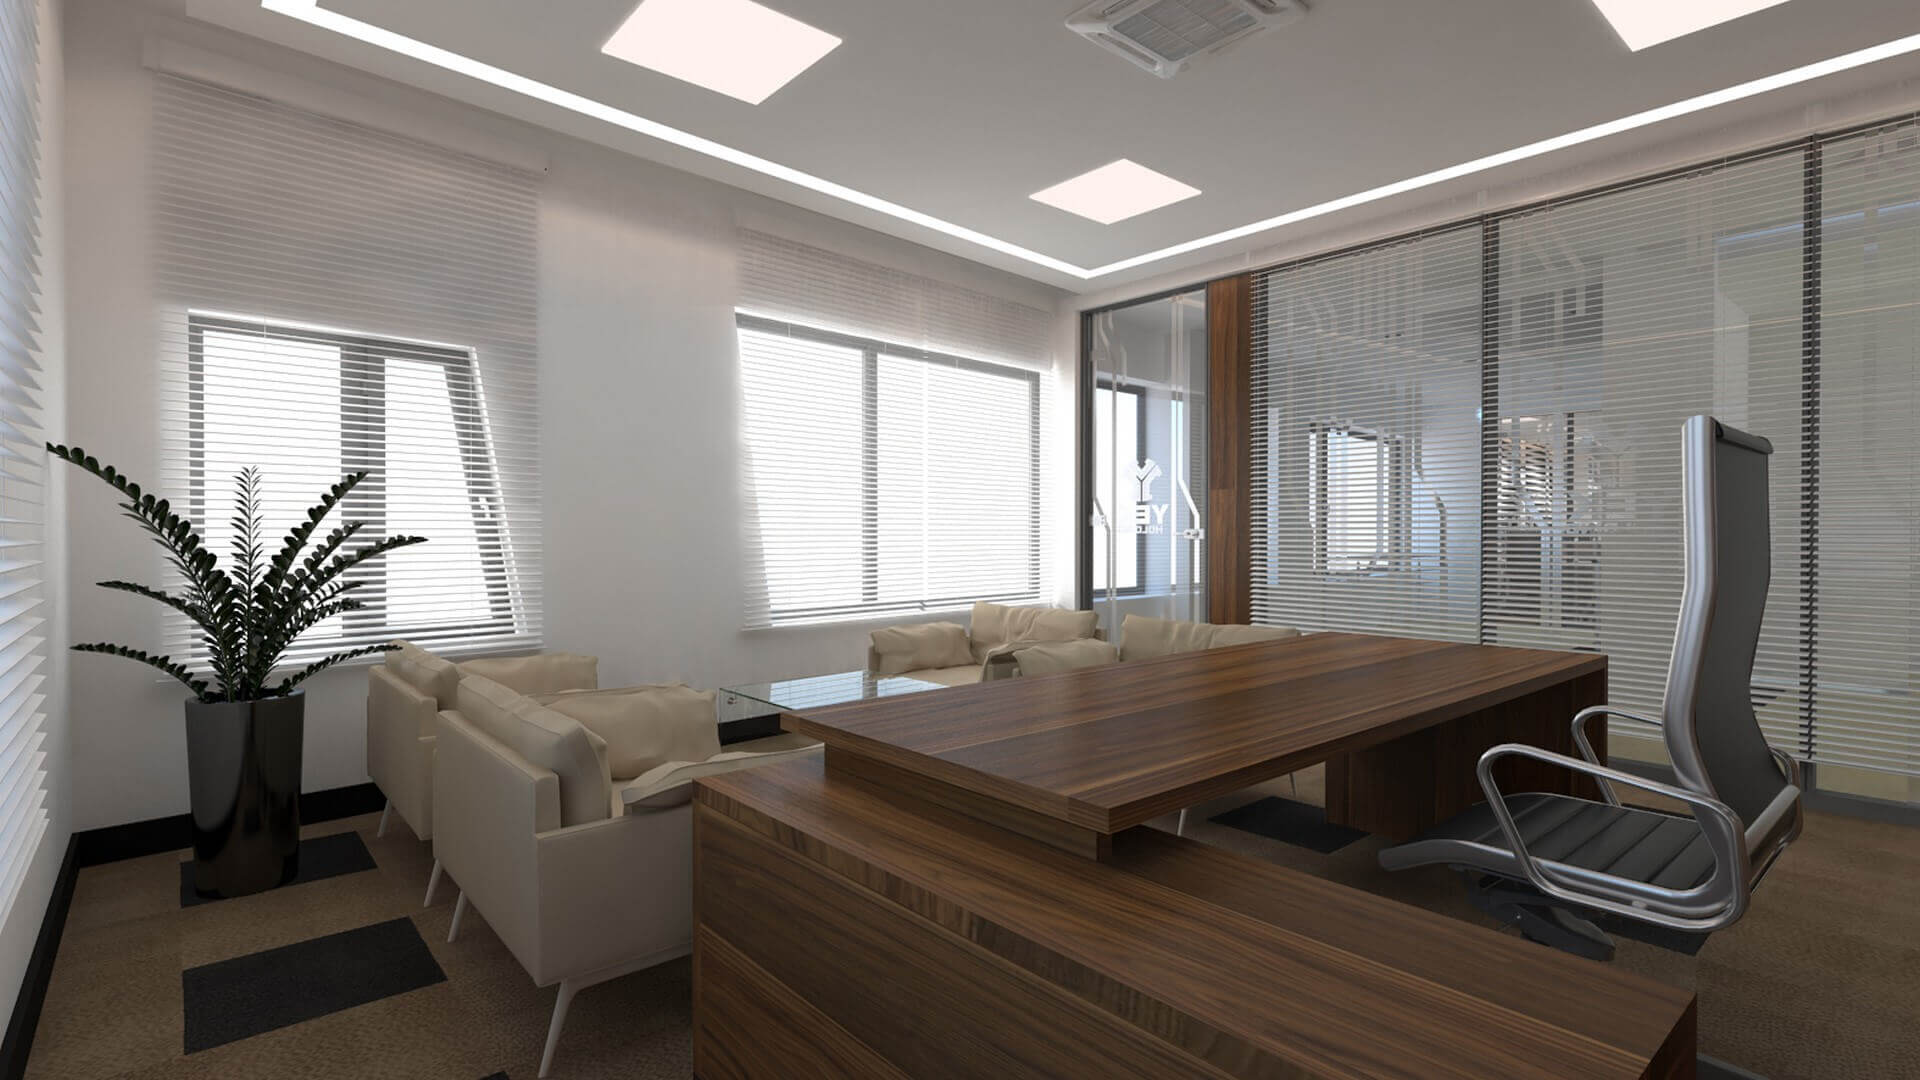 Kartal 2437 Gisas Office Offices